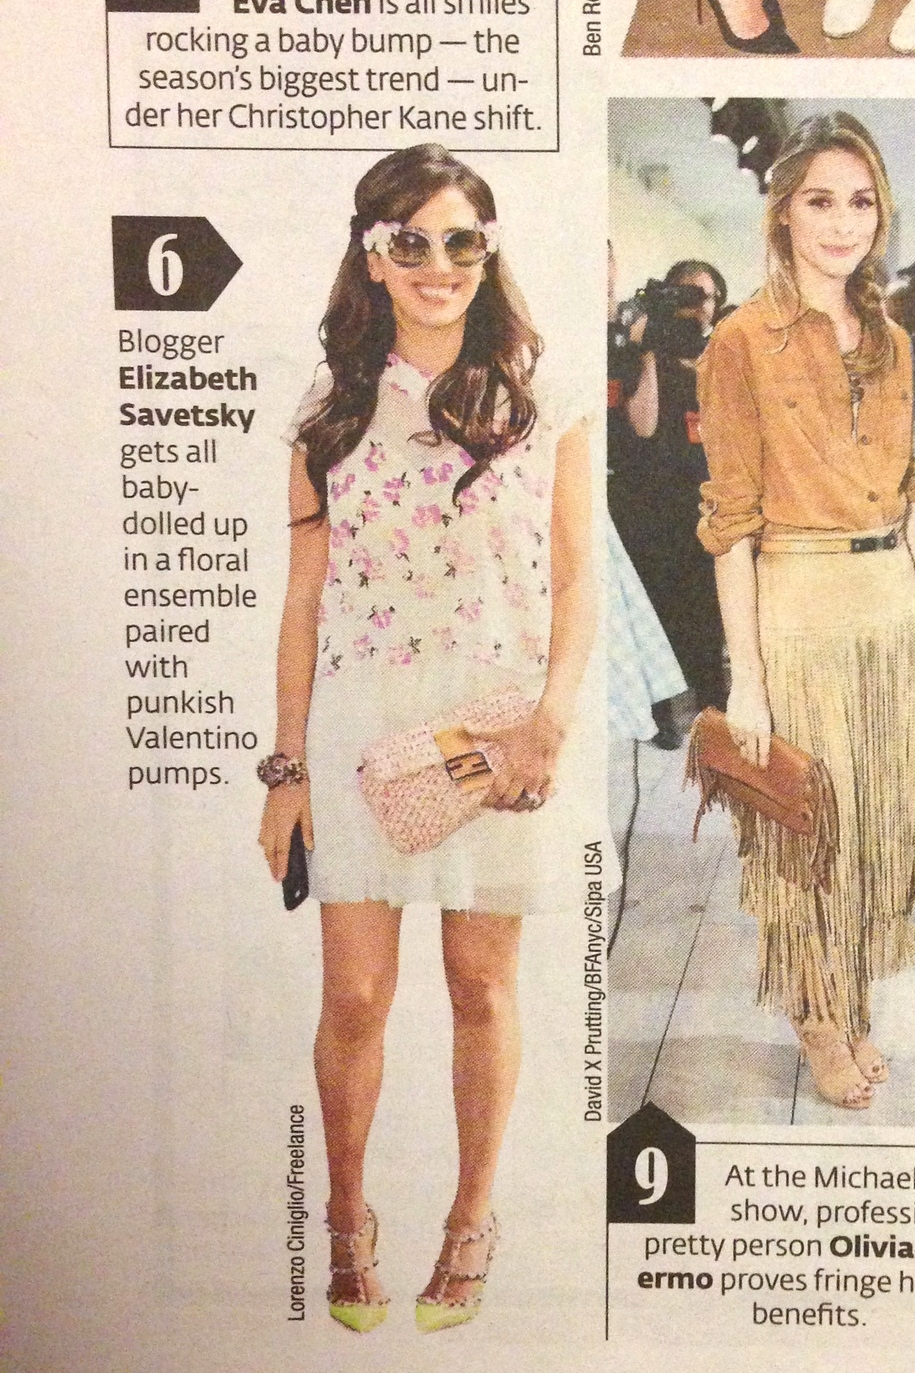 New York Post   The 25 Best Dressed at Fashion Week   Lorezno Ciniglio